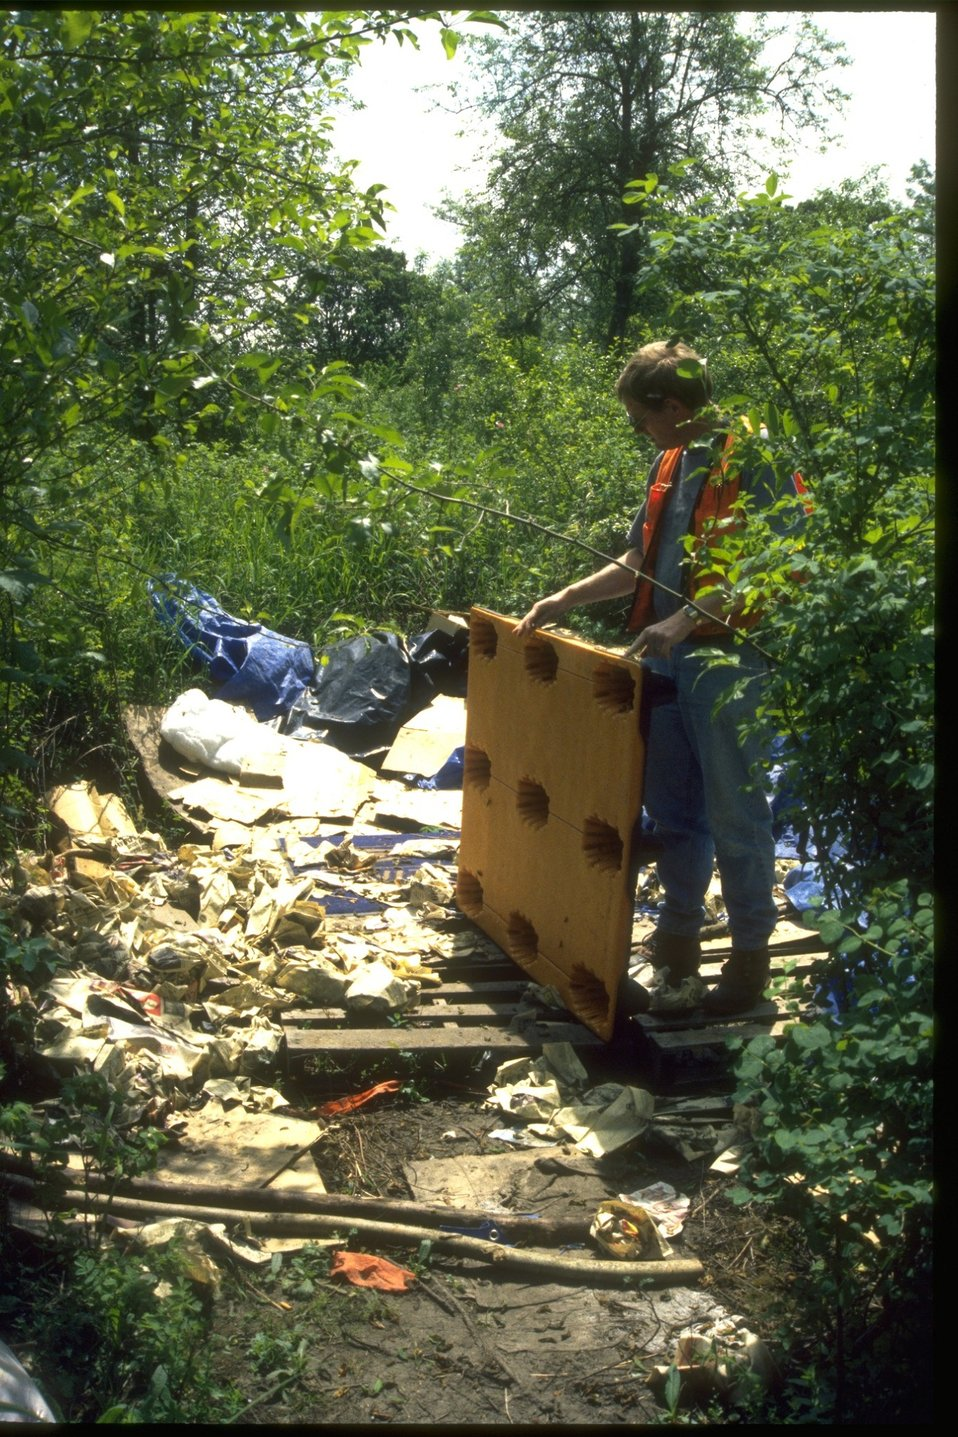 Trash Dumping On Public Lands Public Domain Mark